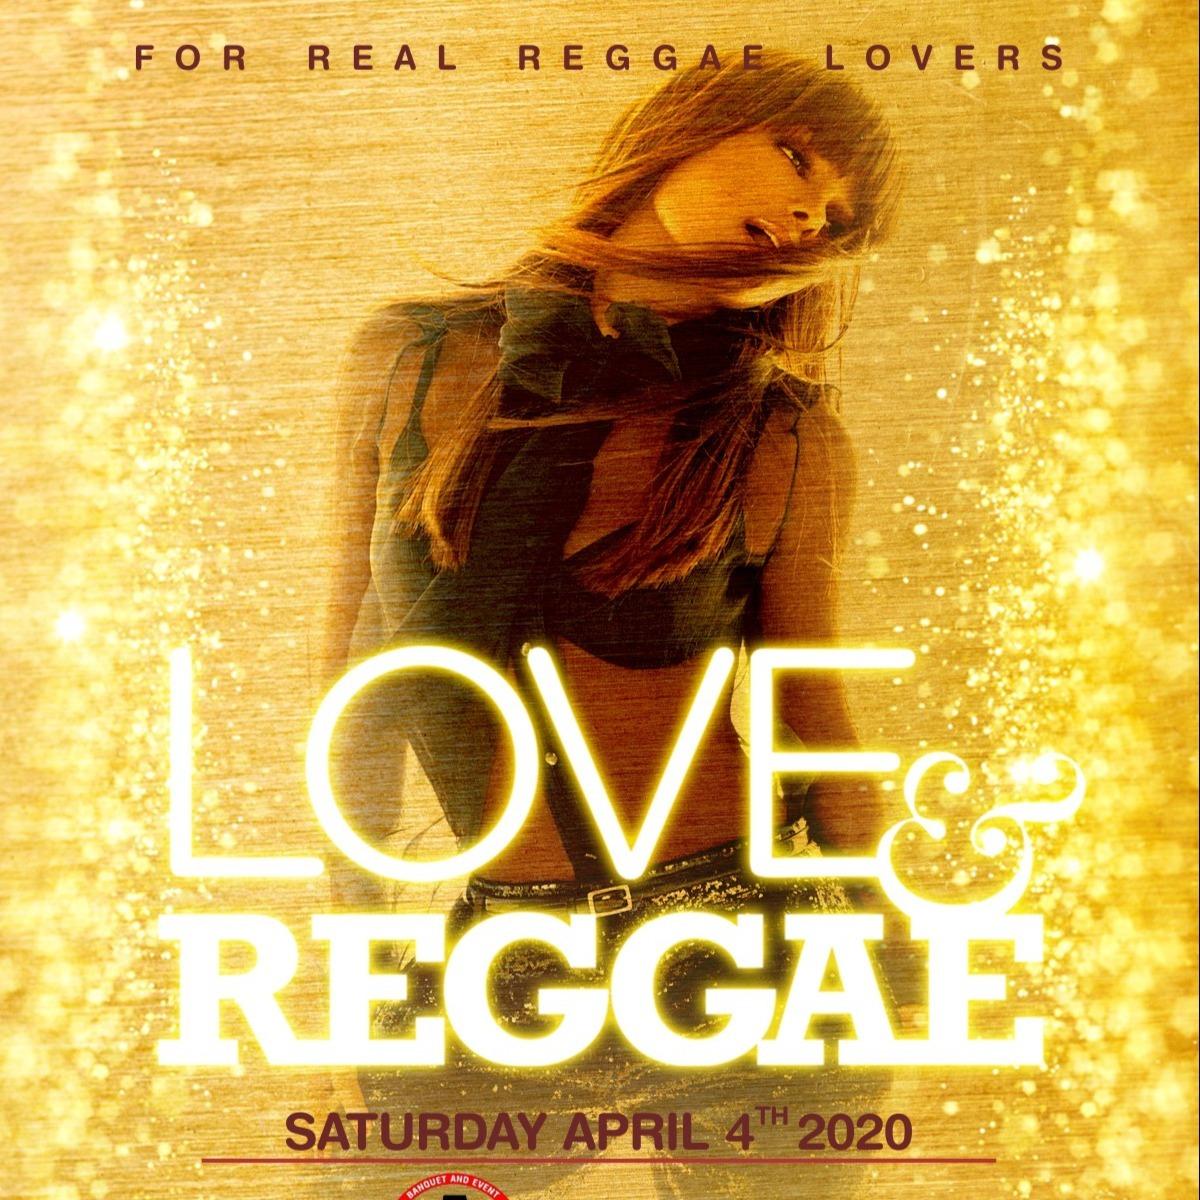 Love And Reggae - For Real Reggae Lovers 2020